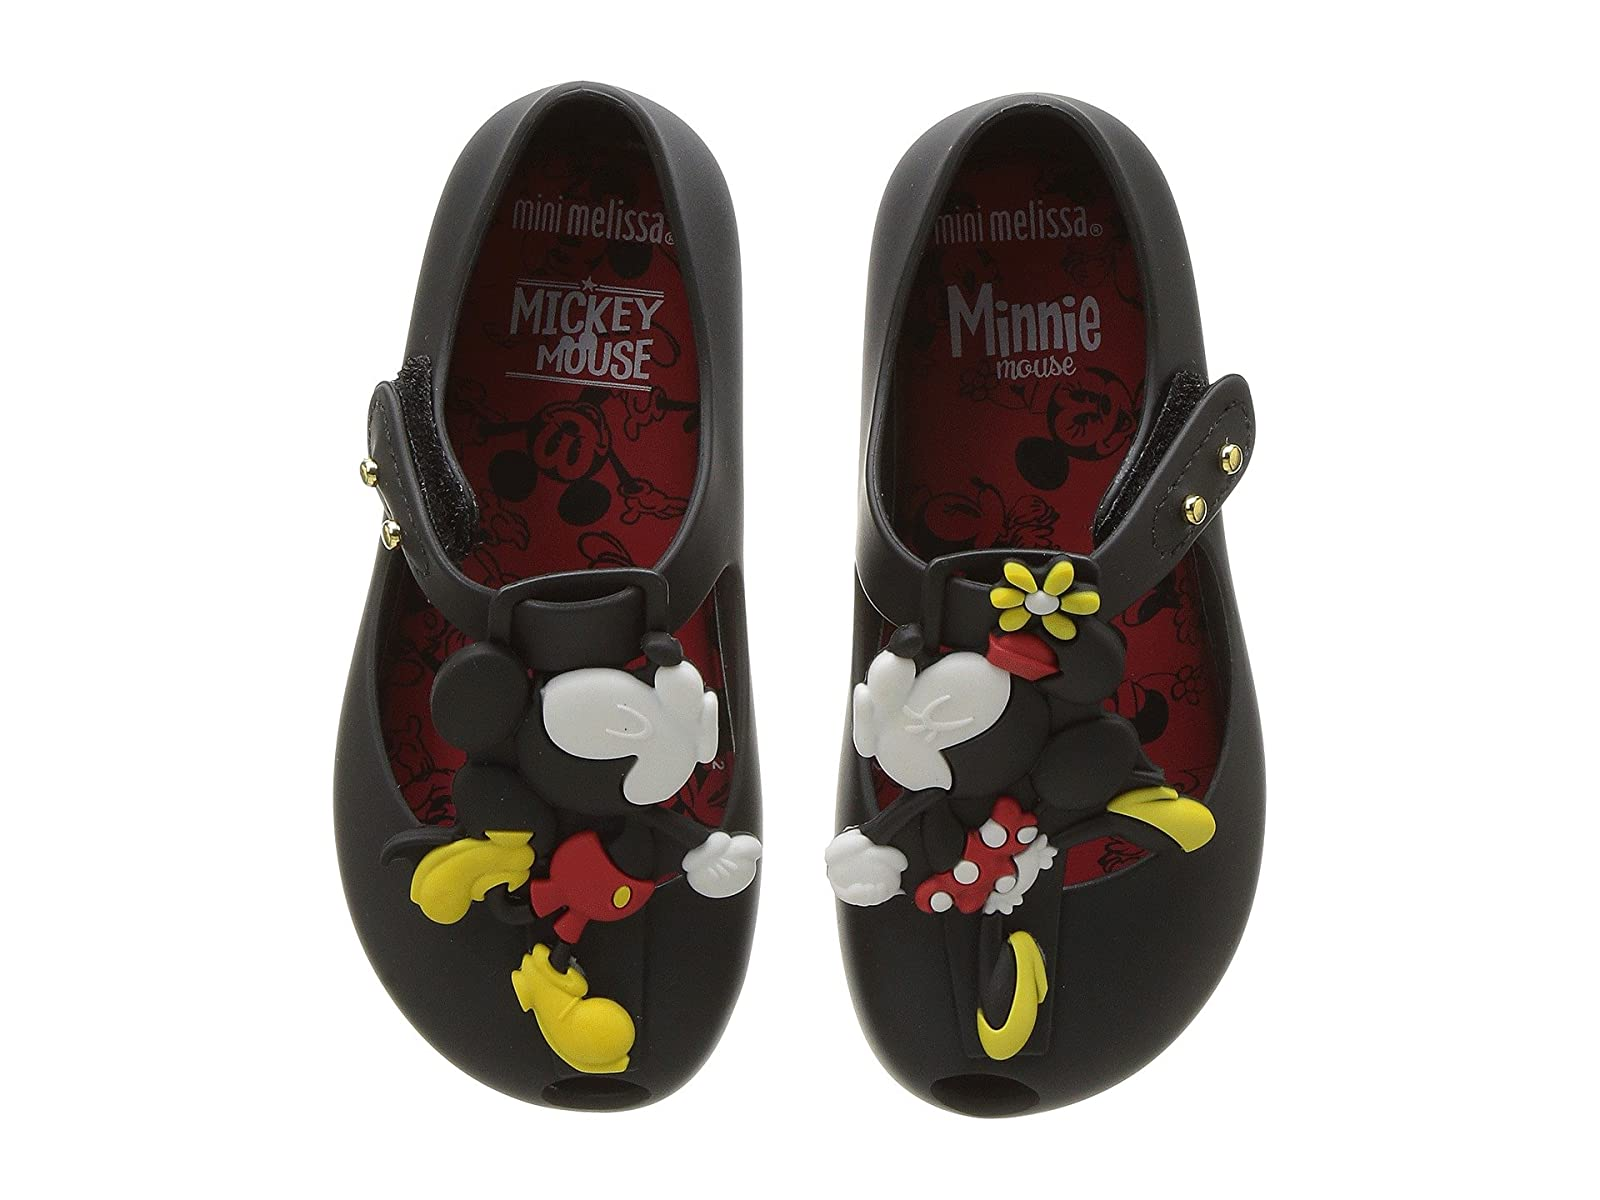 Mini Melissa Mini Ultragirl + Disney (Toddler/Little Kid)Atmospheric grades have affordable shoes